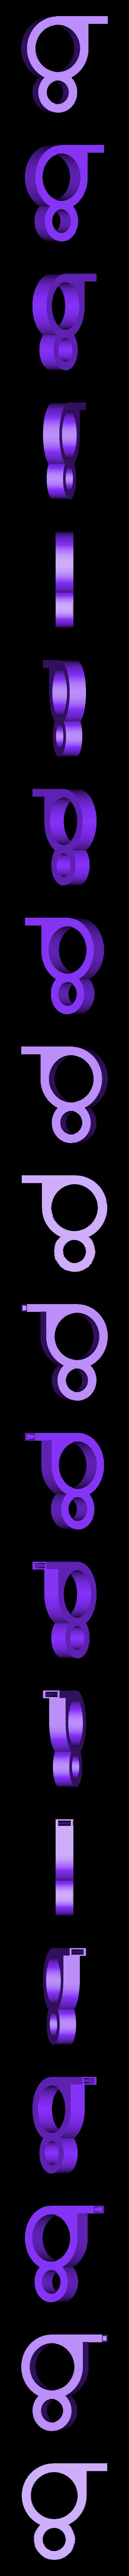 DuoToneWhistle3.stl Download free STL file Duo Tone Whistle • 3D printing model, Raeunn3D